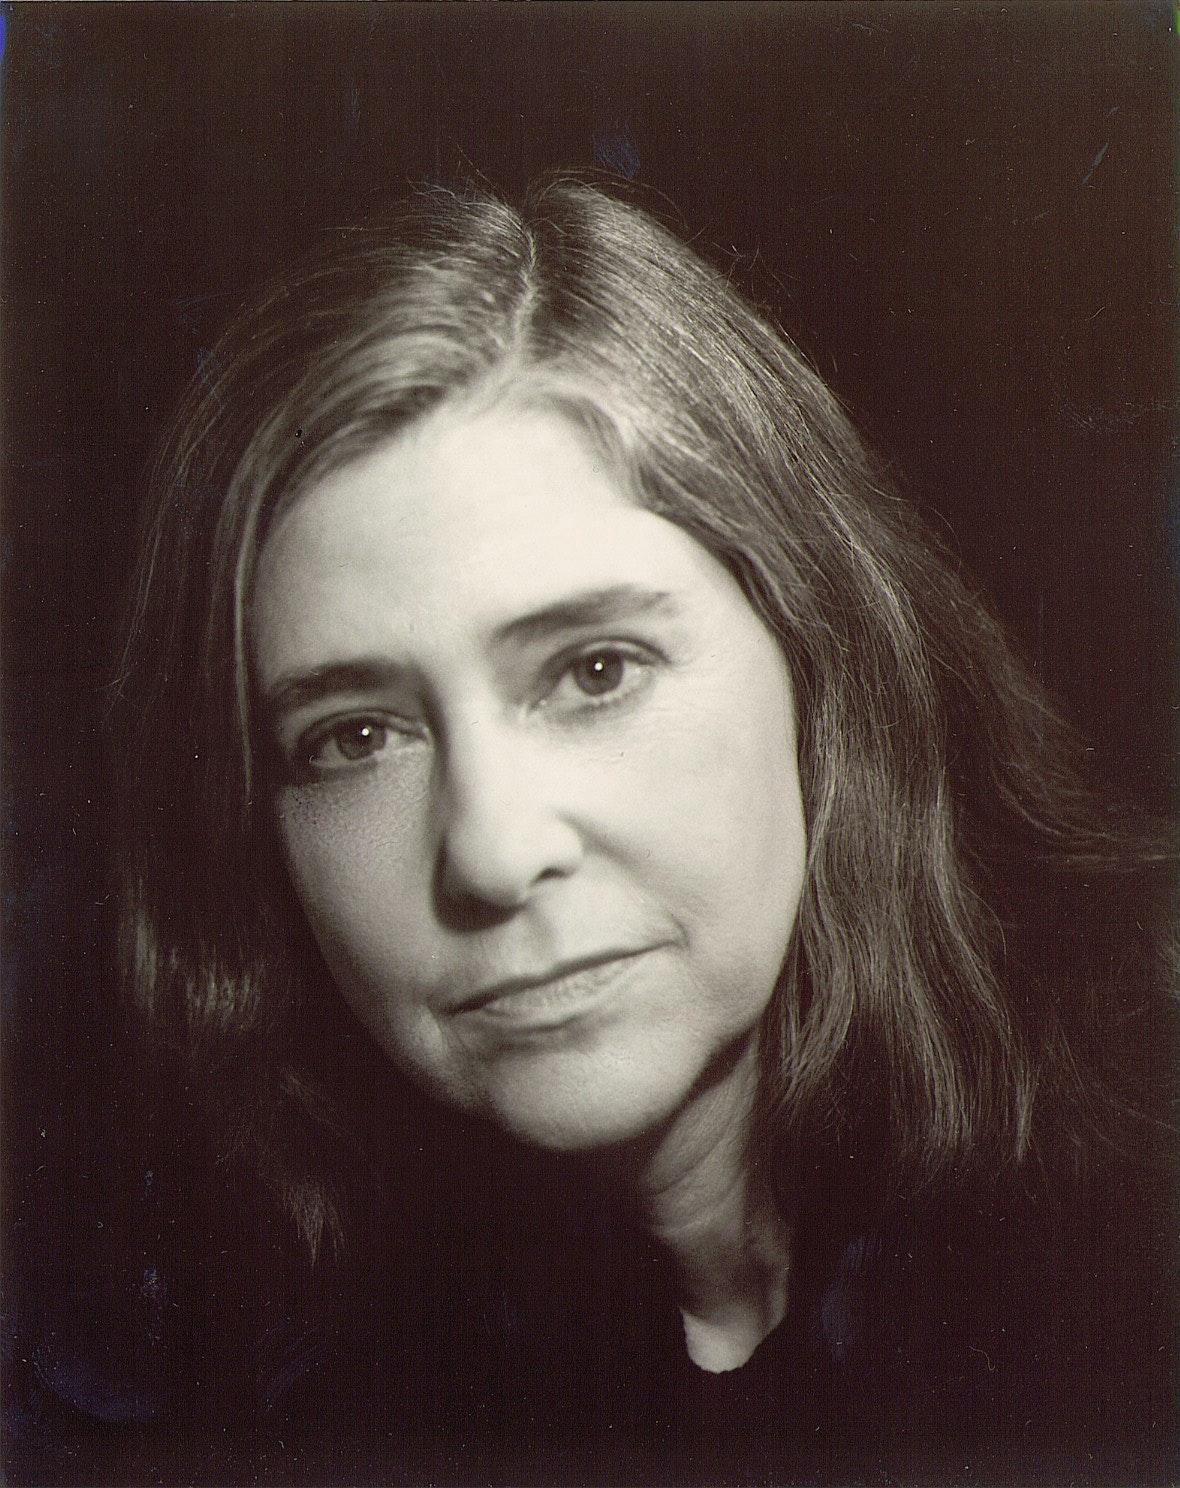 Margaret_Hamilton_1995.jpg